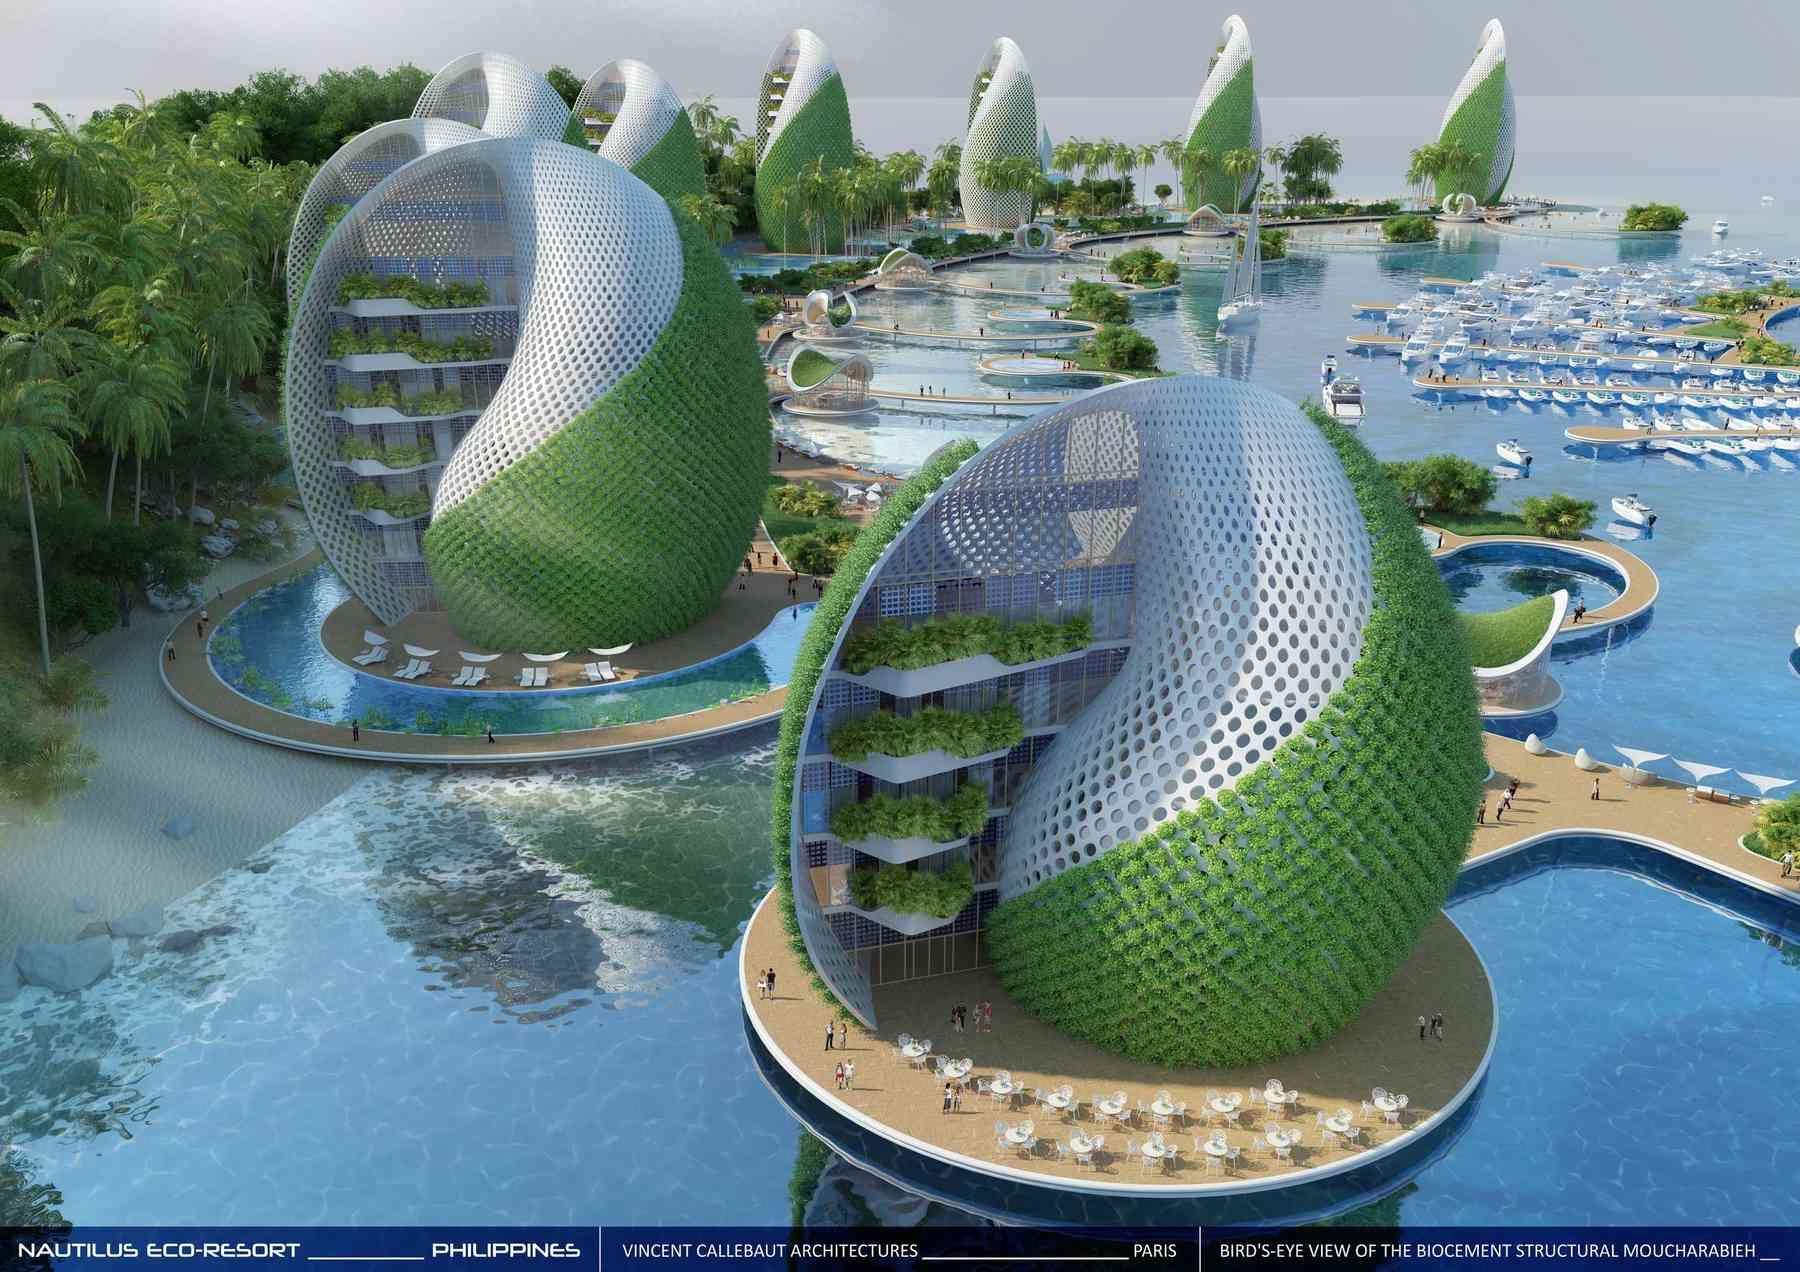 Nautilus Eco Resort By Vincent Callebaut Architectures In